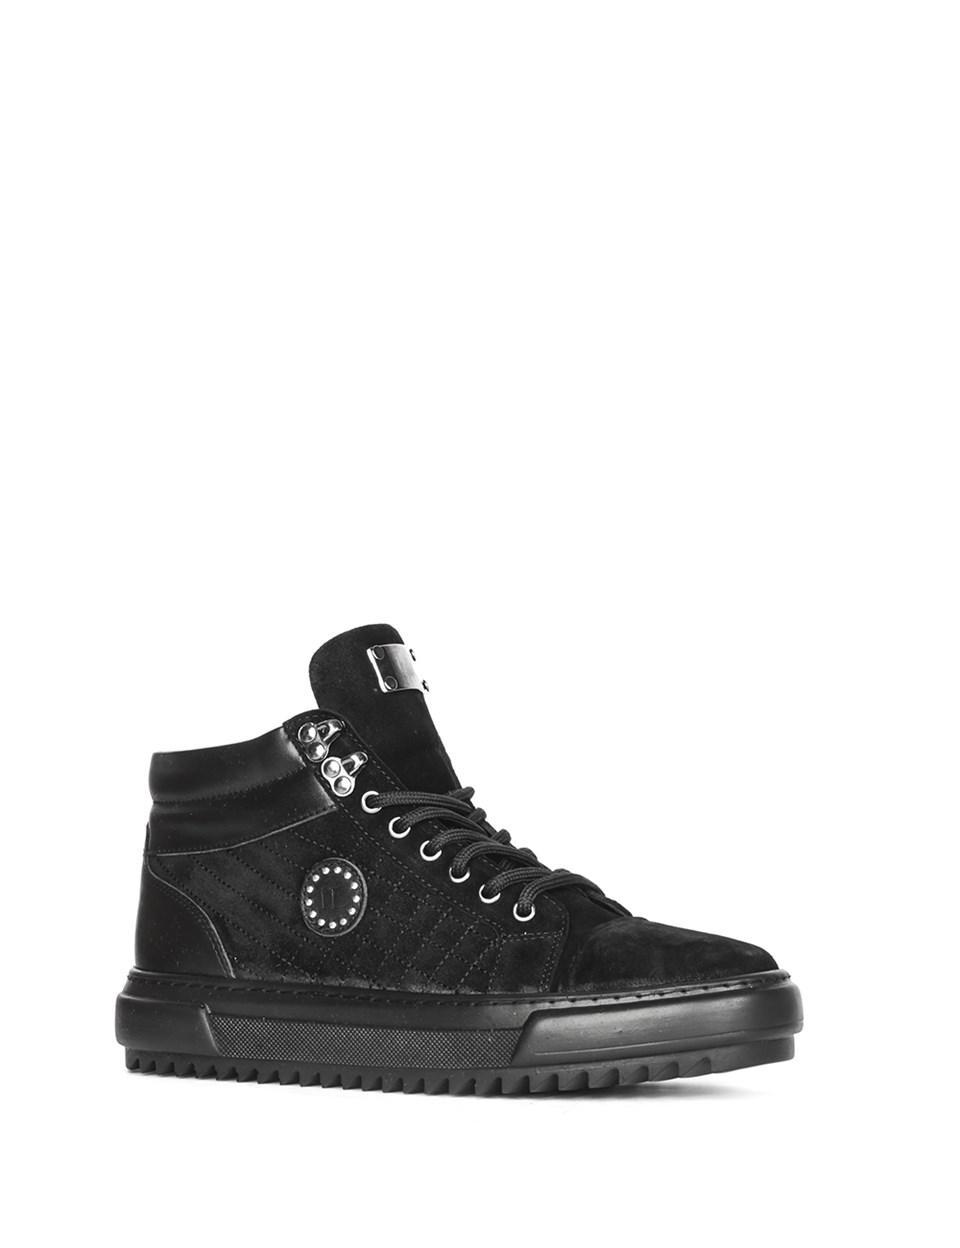 2020 Ripon Men's Boot Black Suede casual shoes